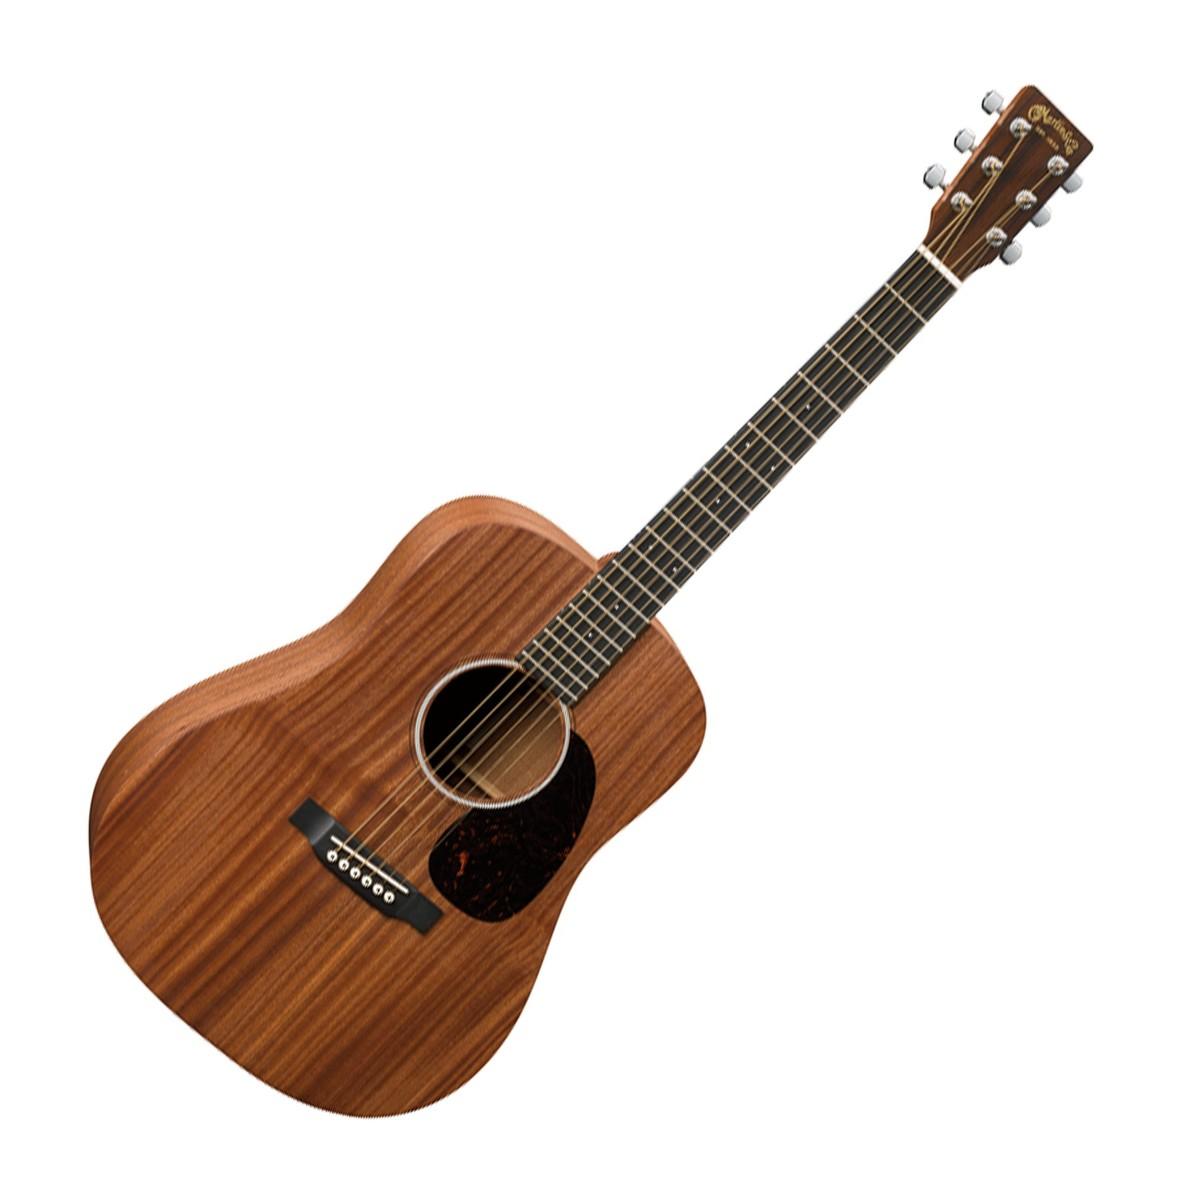 martin dreadnought jr 2e acoustic guitar sapele box opened at gear4music. Black Bedroom Furniture Sets. Home Design Ideas